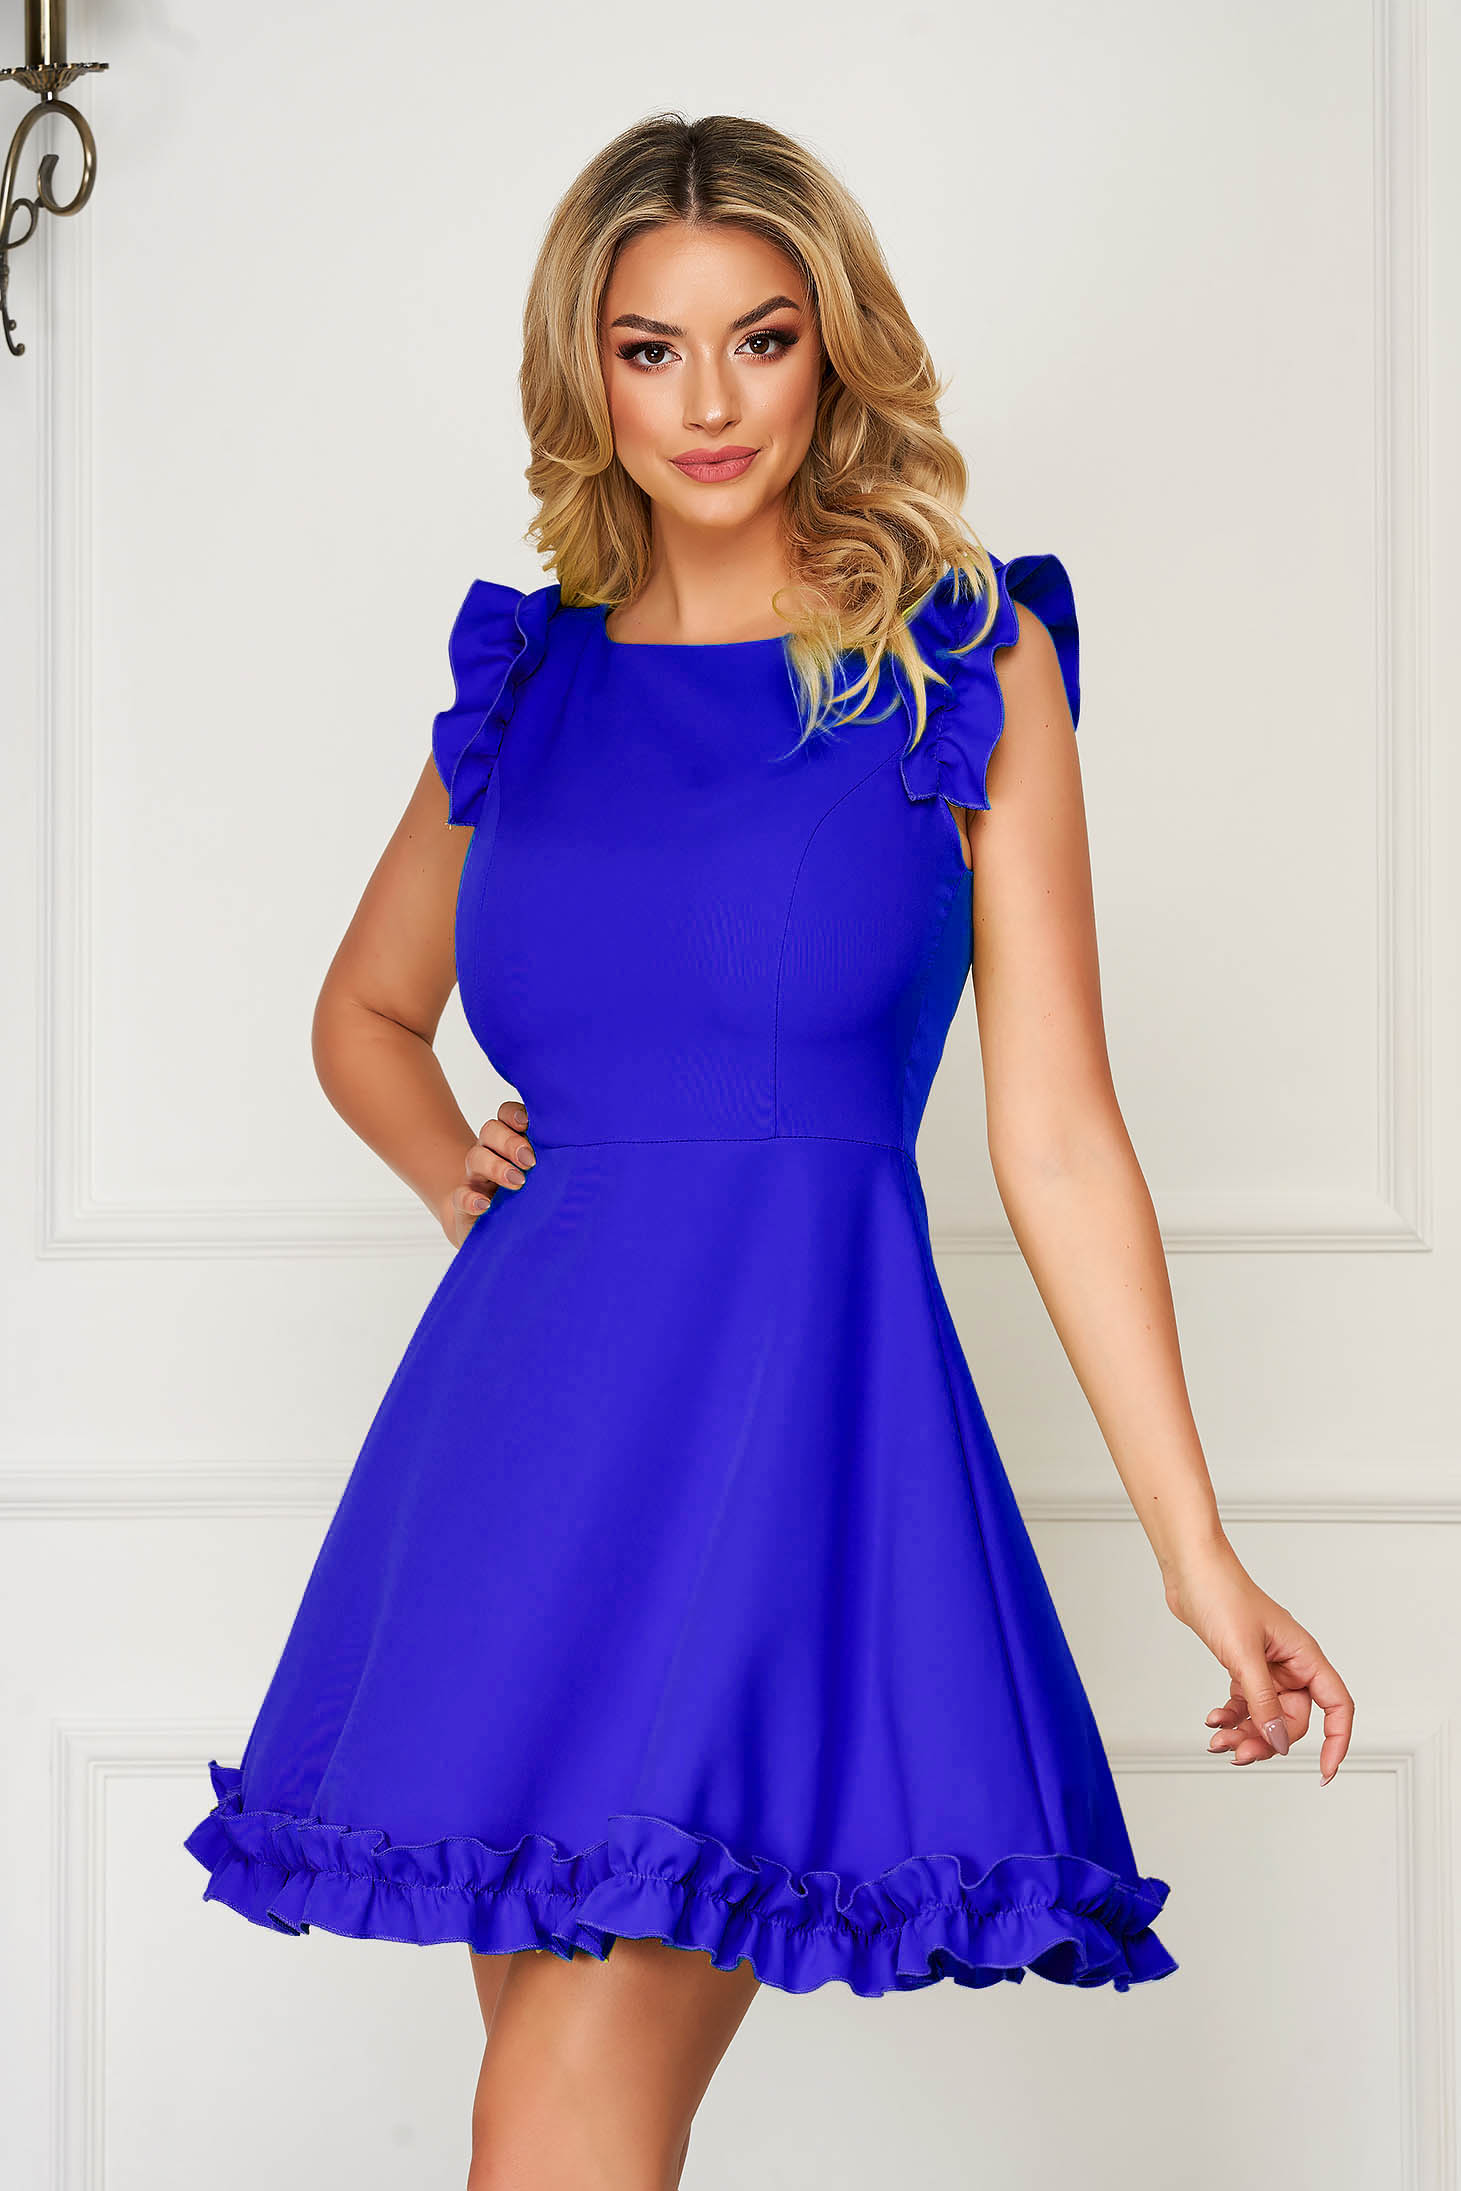 StarShinerS blue dress elegant short cut cloth with ruffled sleeves